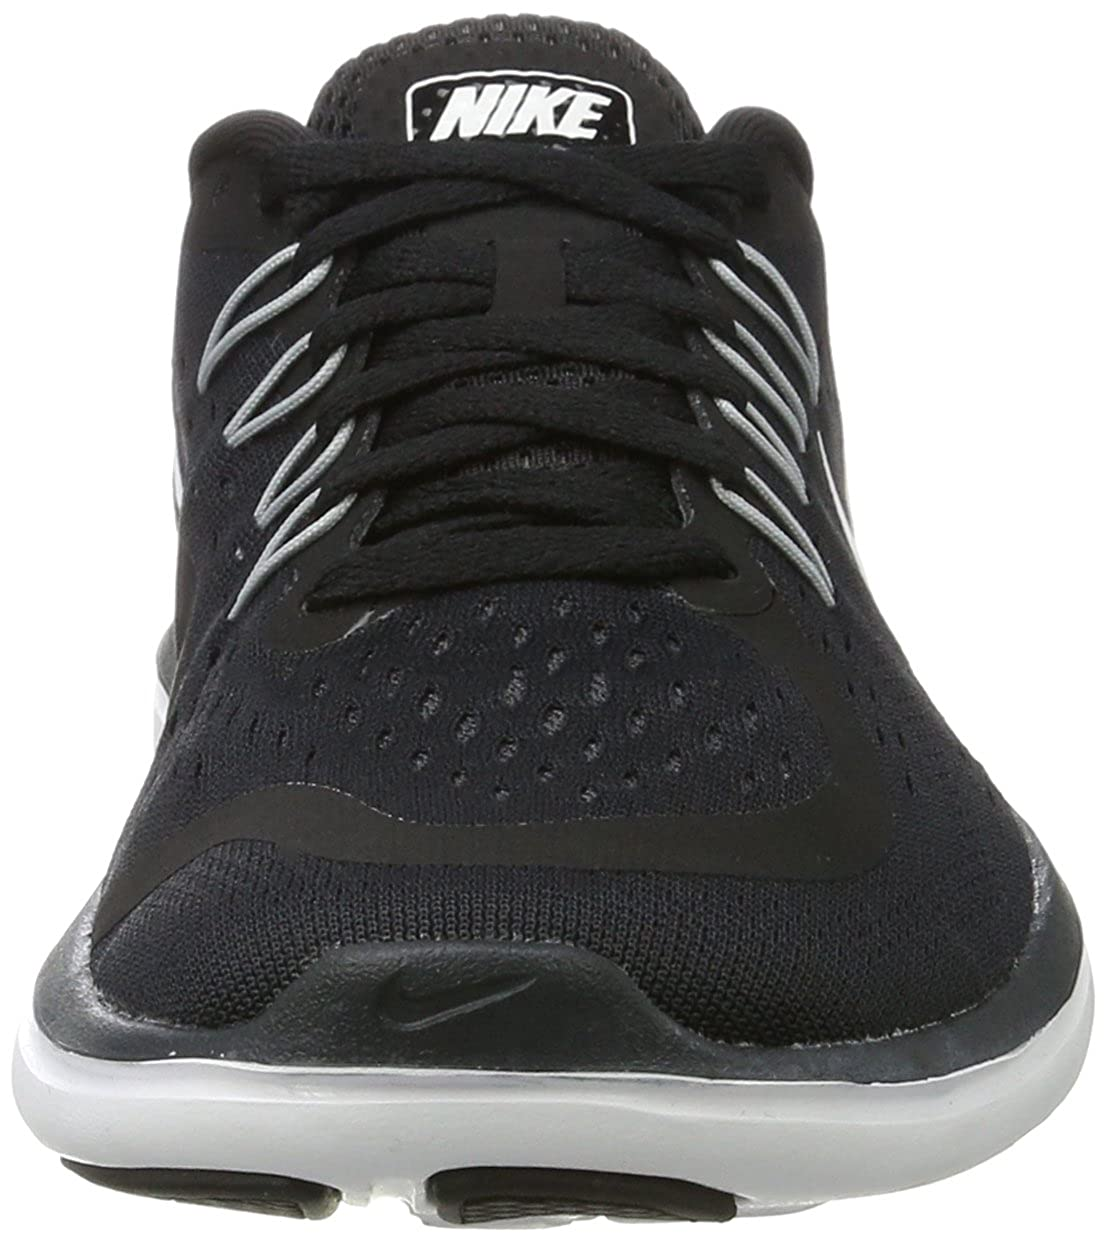 172c75b2b501 Nike Damen Flex 2017 RN Traillaufschuhe